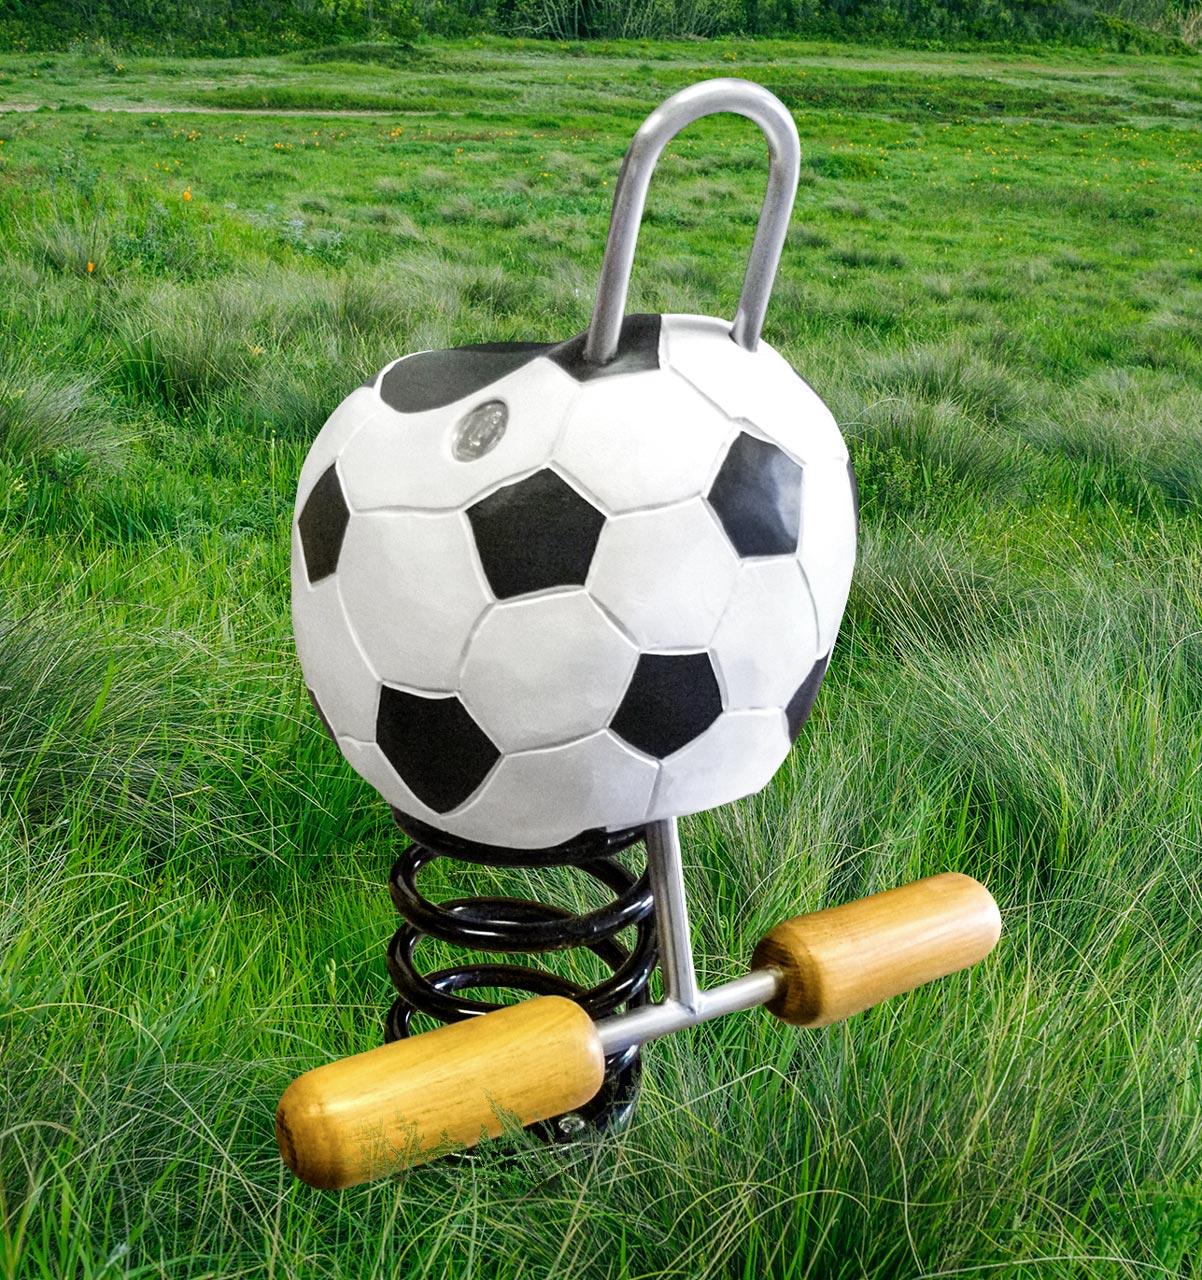 P 141 Federwipper Fußball | Wackelfußball